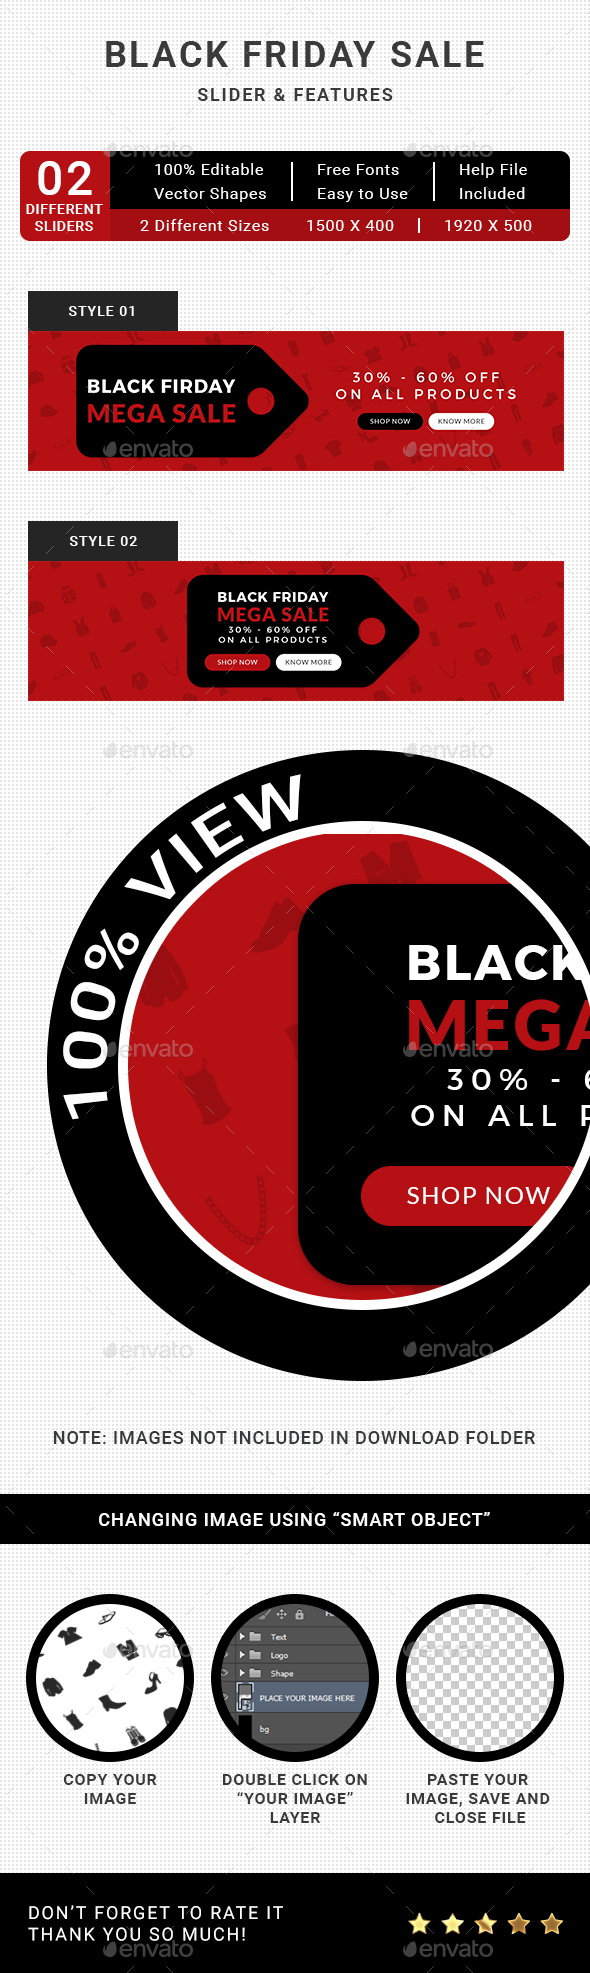 Black Friday Sale Slider - Sliders & Features Web Elements